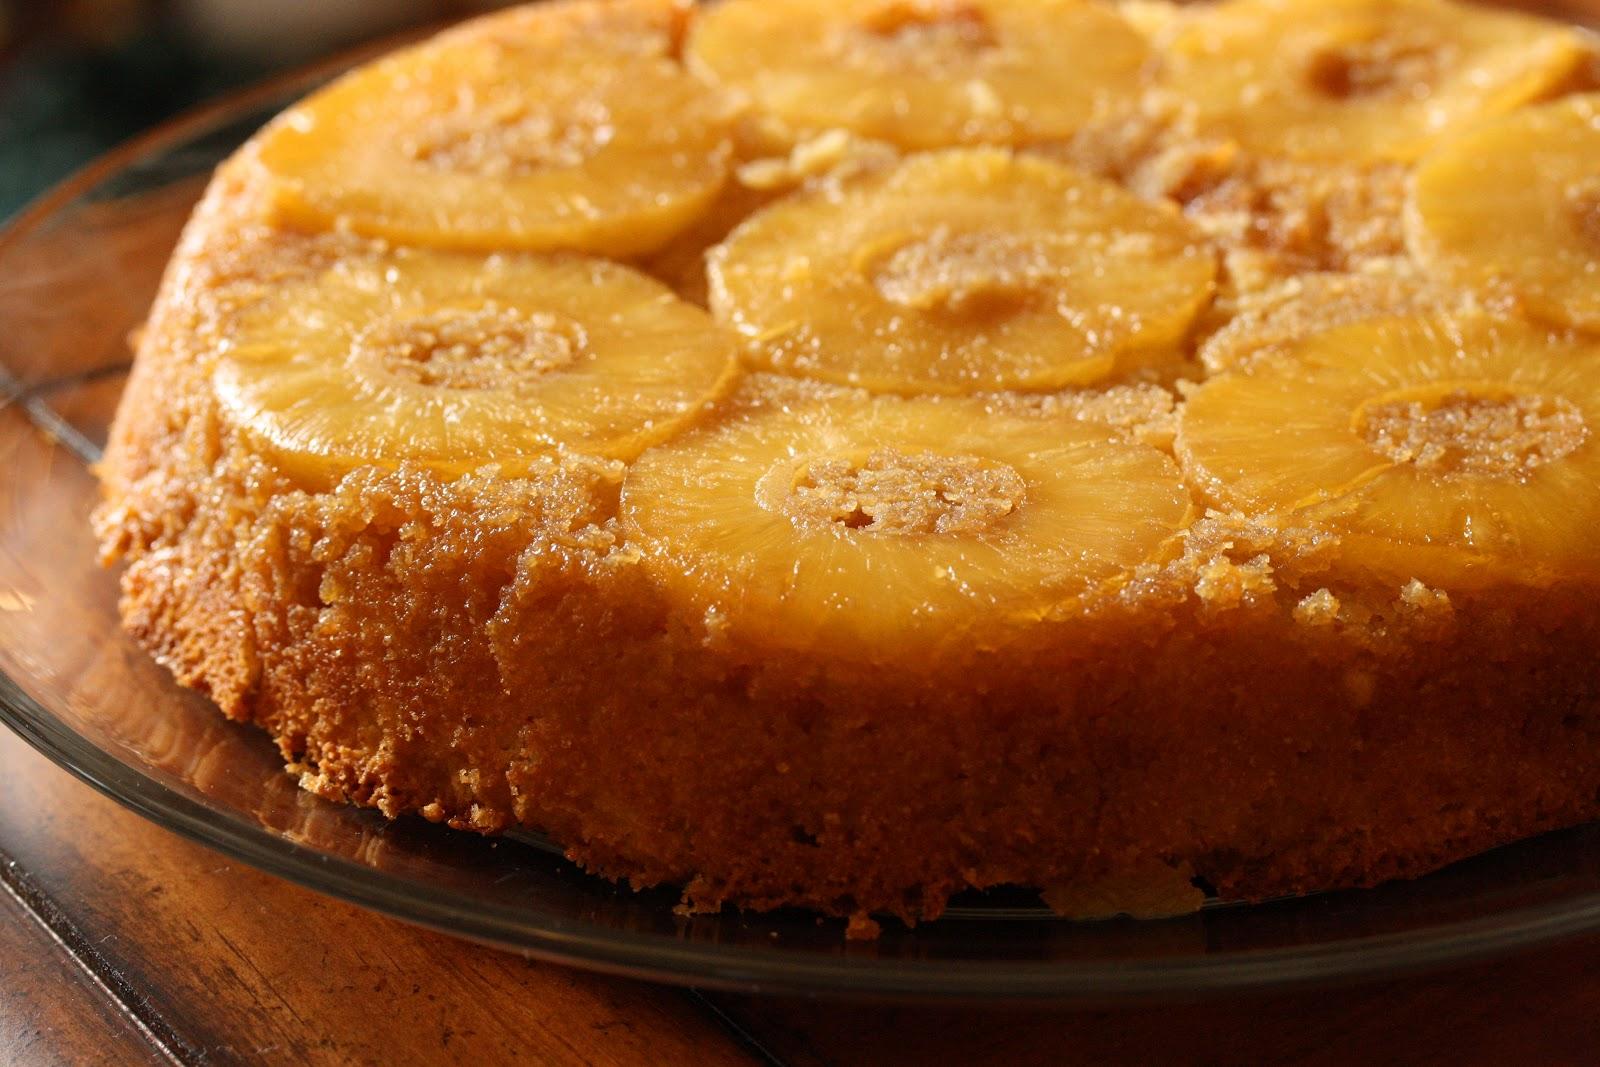 No Pineapple Upside Down Cake